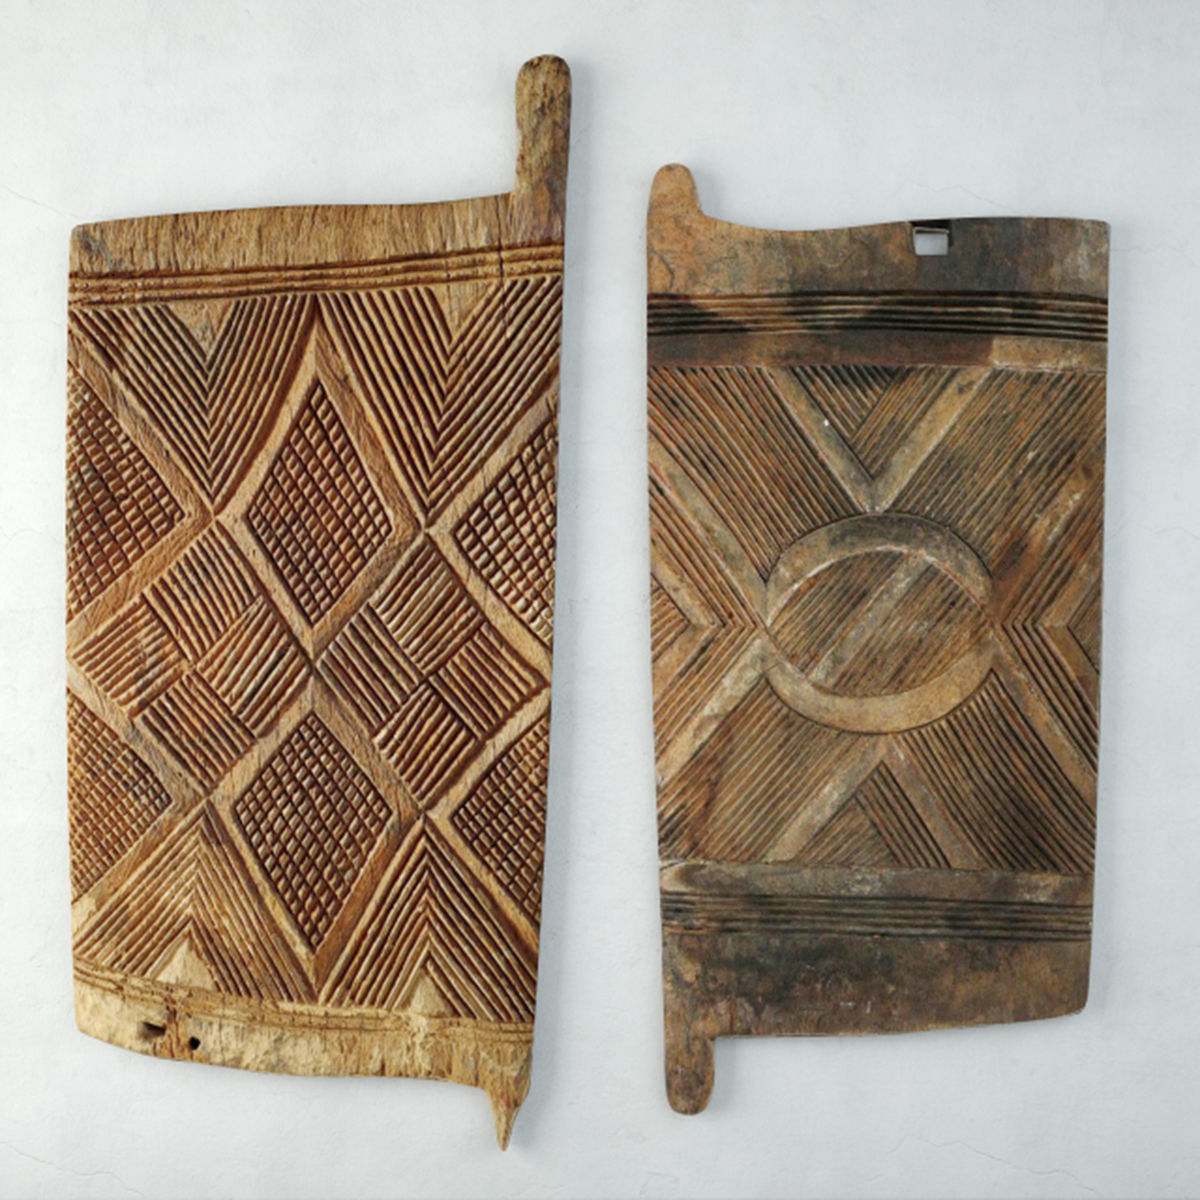 Igbo Doors from Nigeria